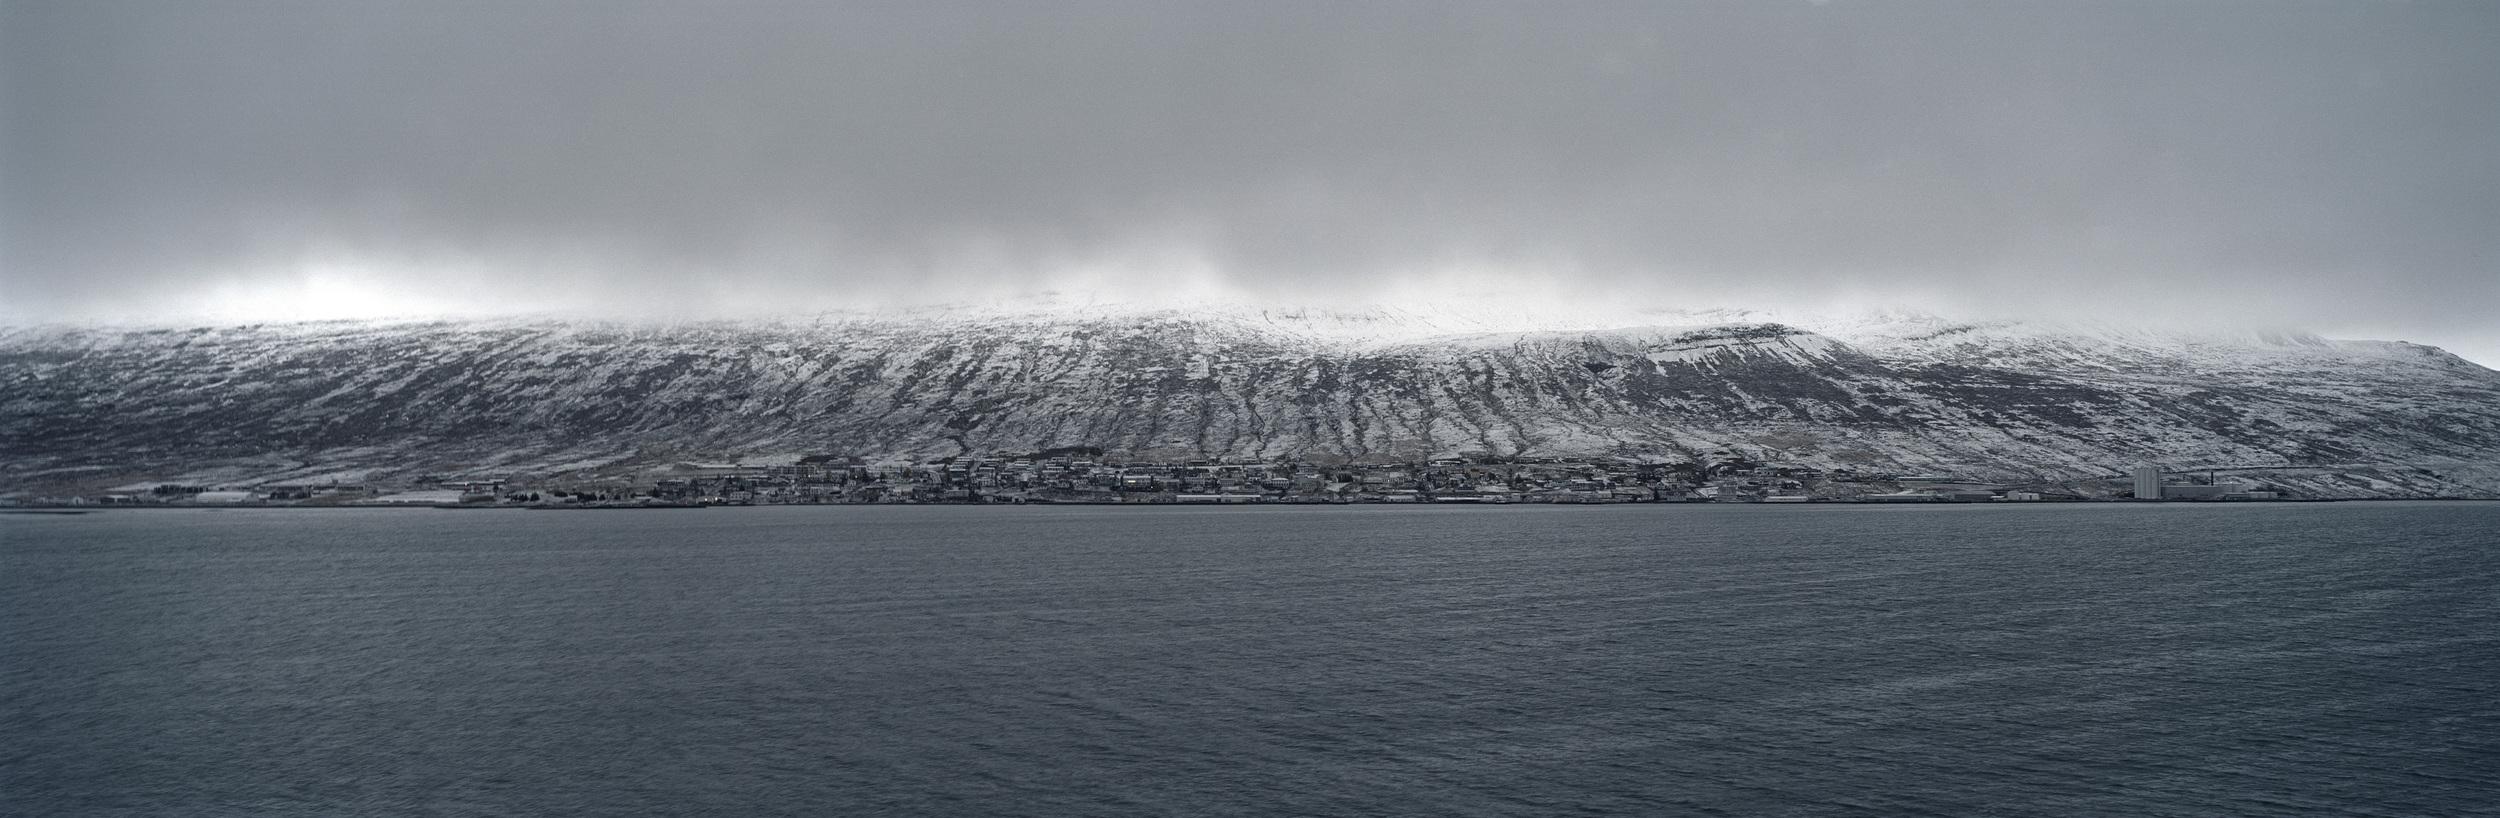 12.Village in the Southeast fjords, the town of Reyðarfjörður on the edge of twilight.